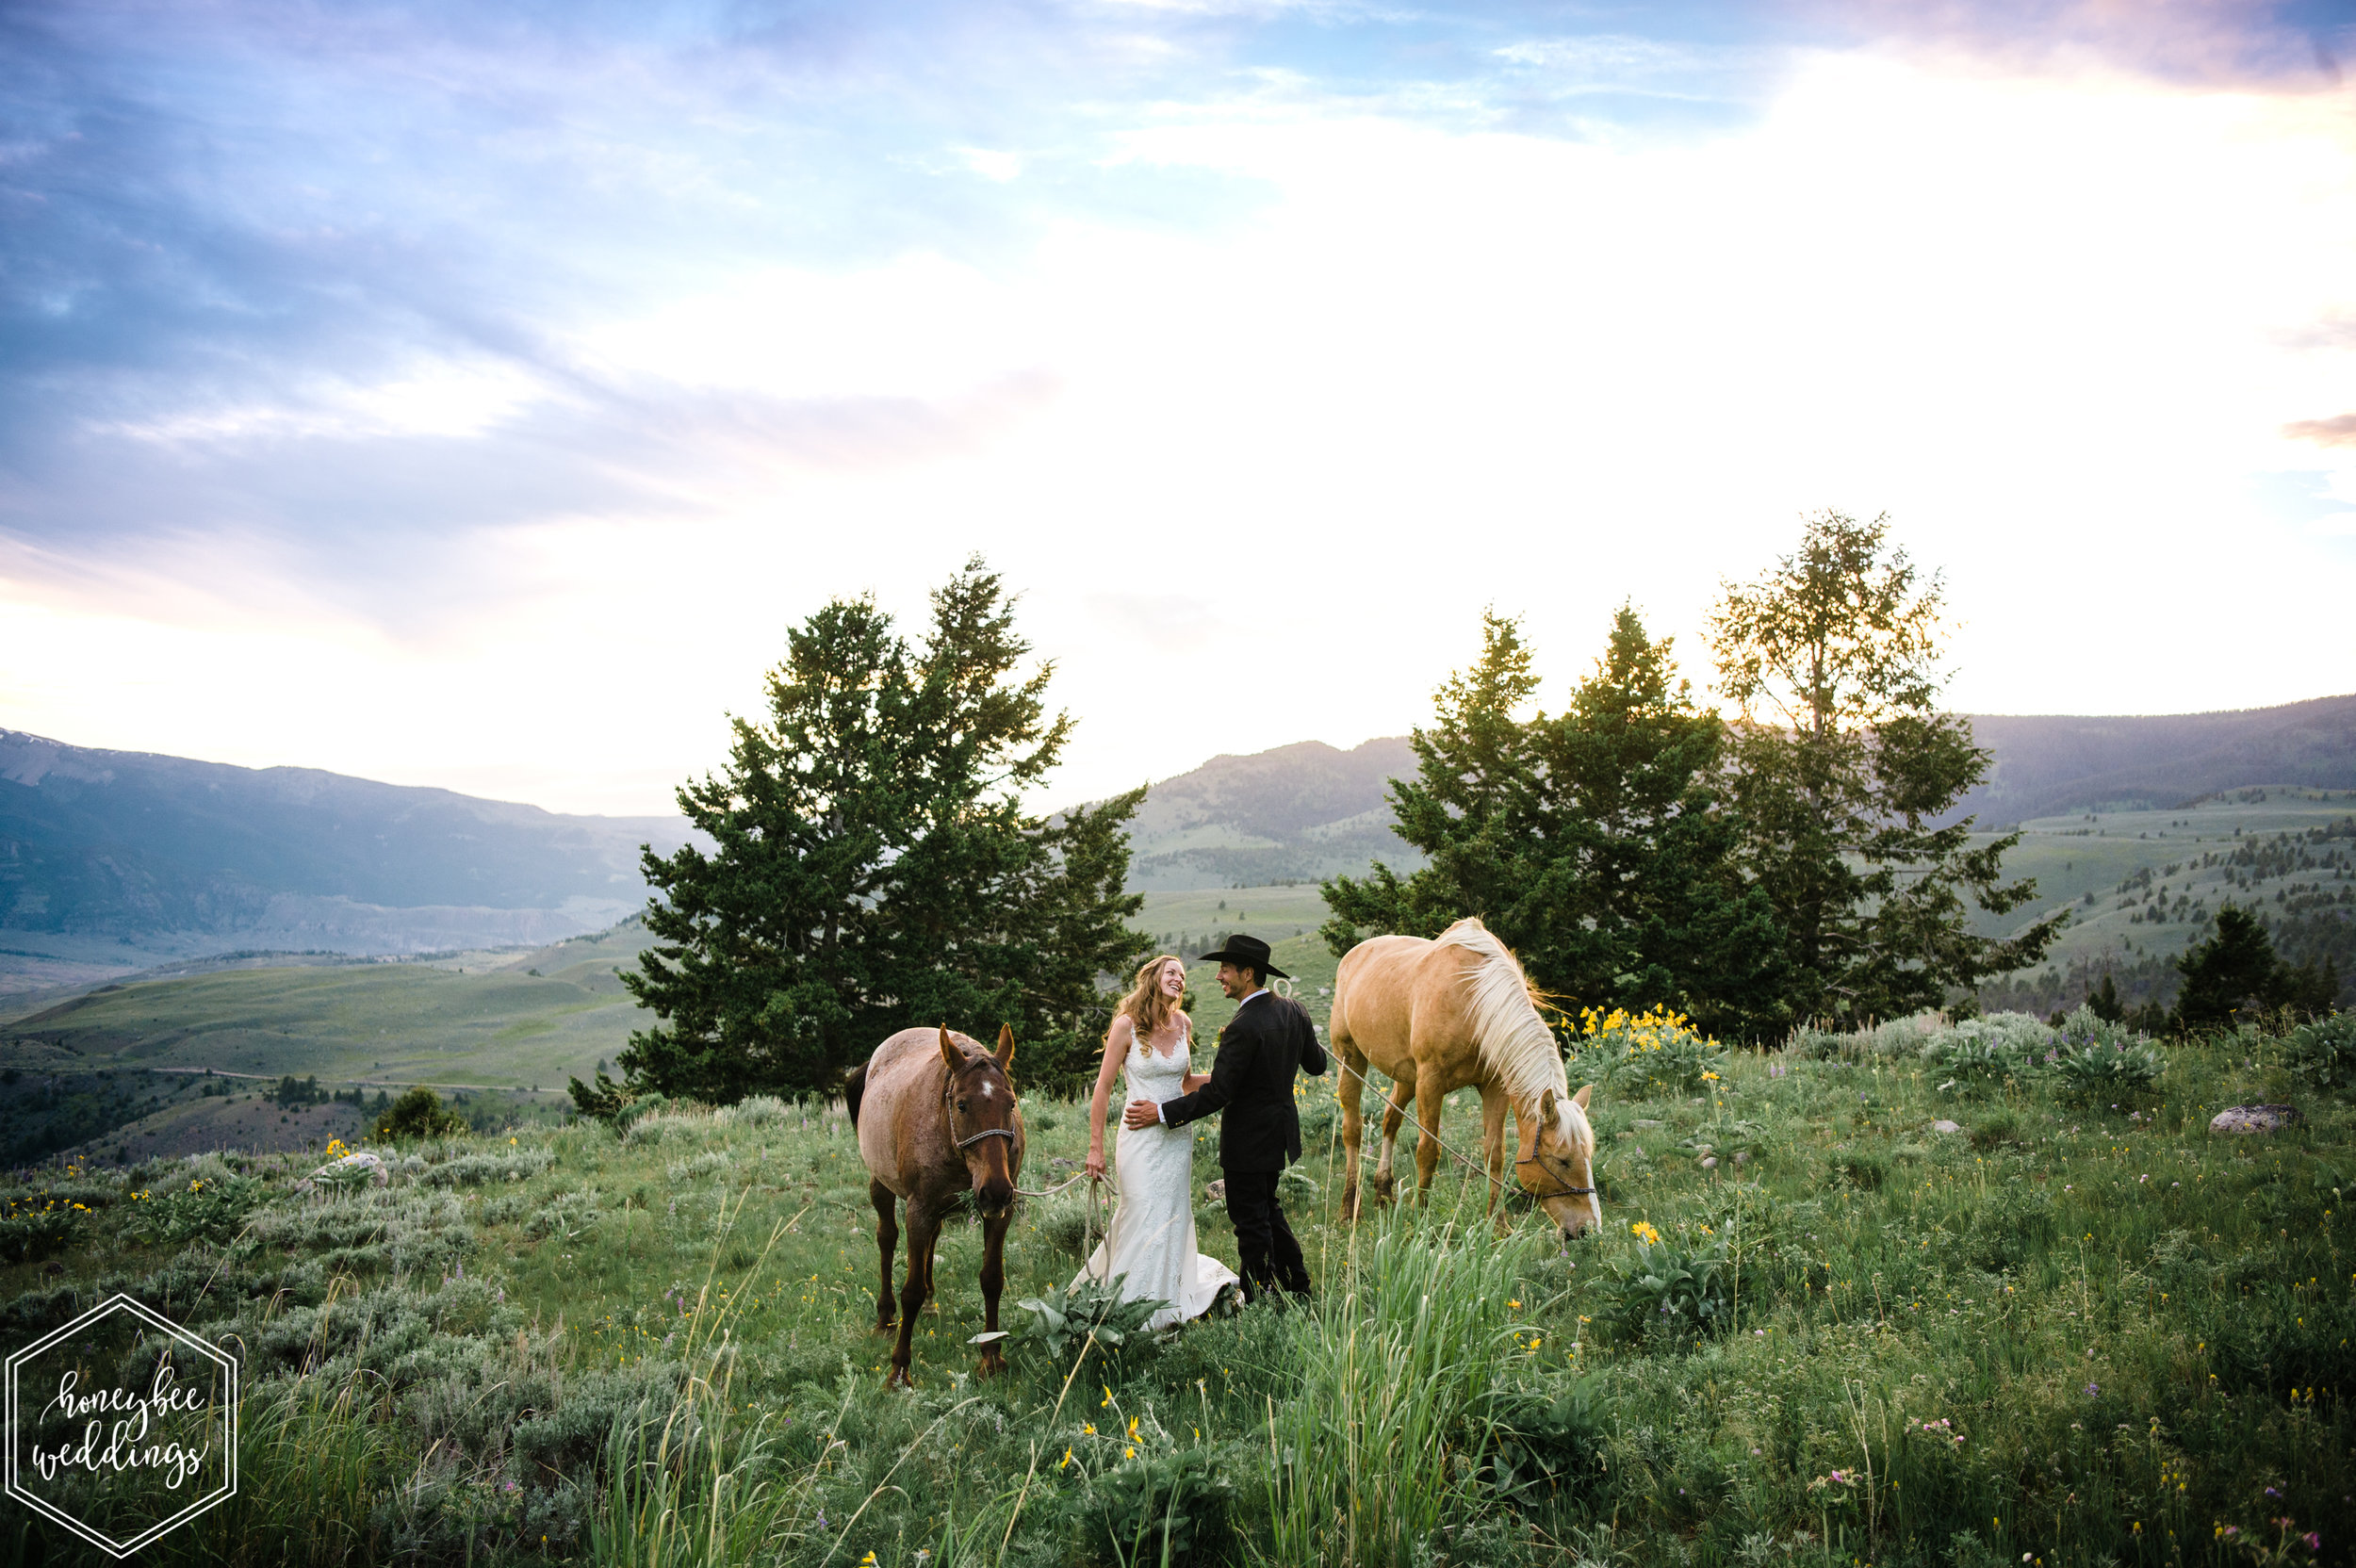 260Yellowstone National Park Wedding_Montana Wedding Photographer_Honeybee Weddings_Shannon & Jonathan_June 29, 2019-1094.jpg